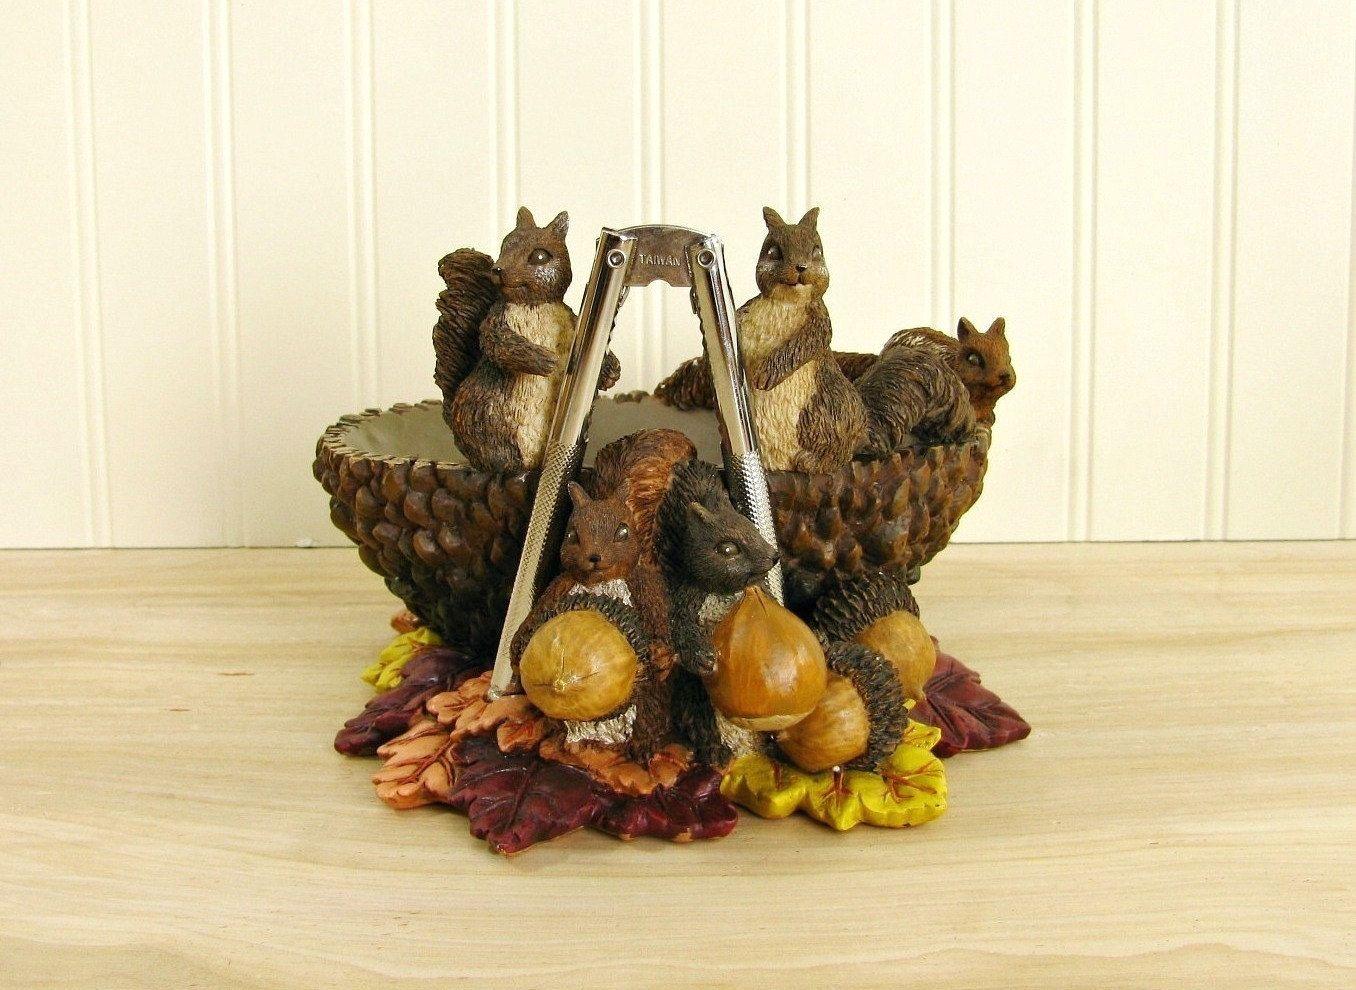 Vintage Resin Squirrel Nut Bowl With Nut Cracker Squirrel Figurine Cabin  Decoru2026